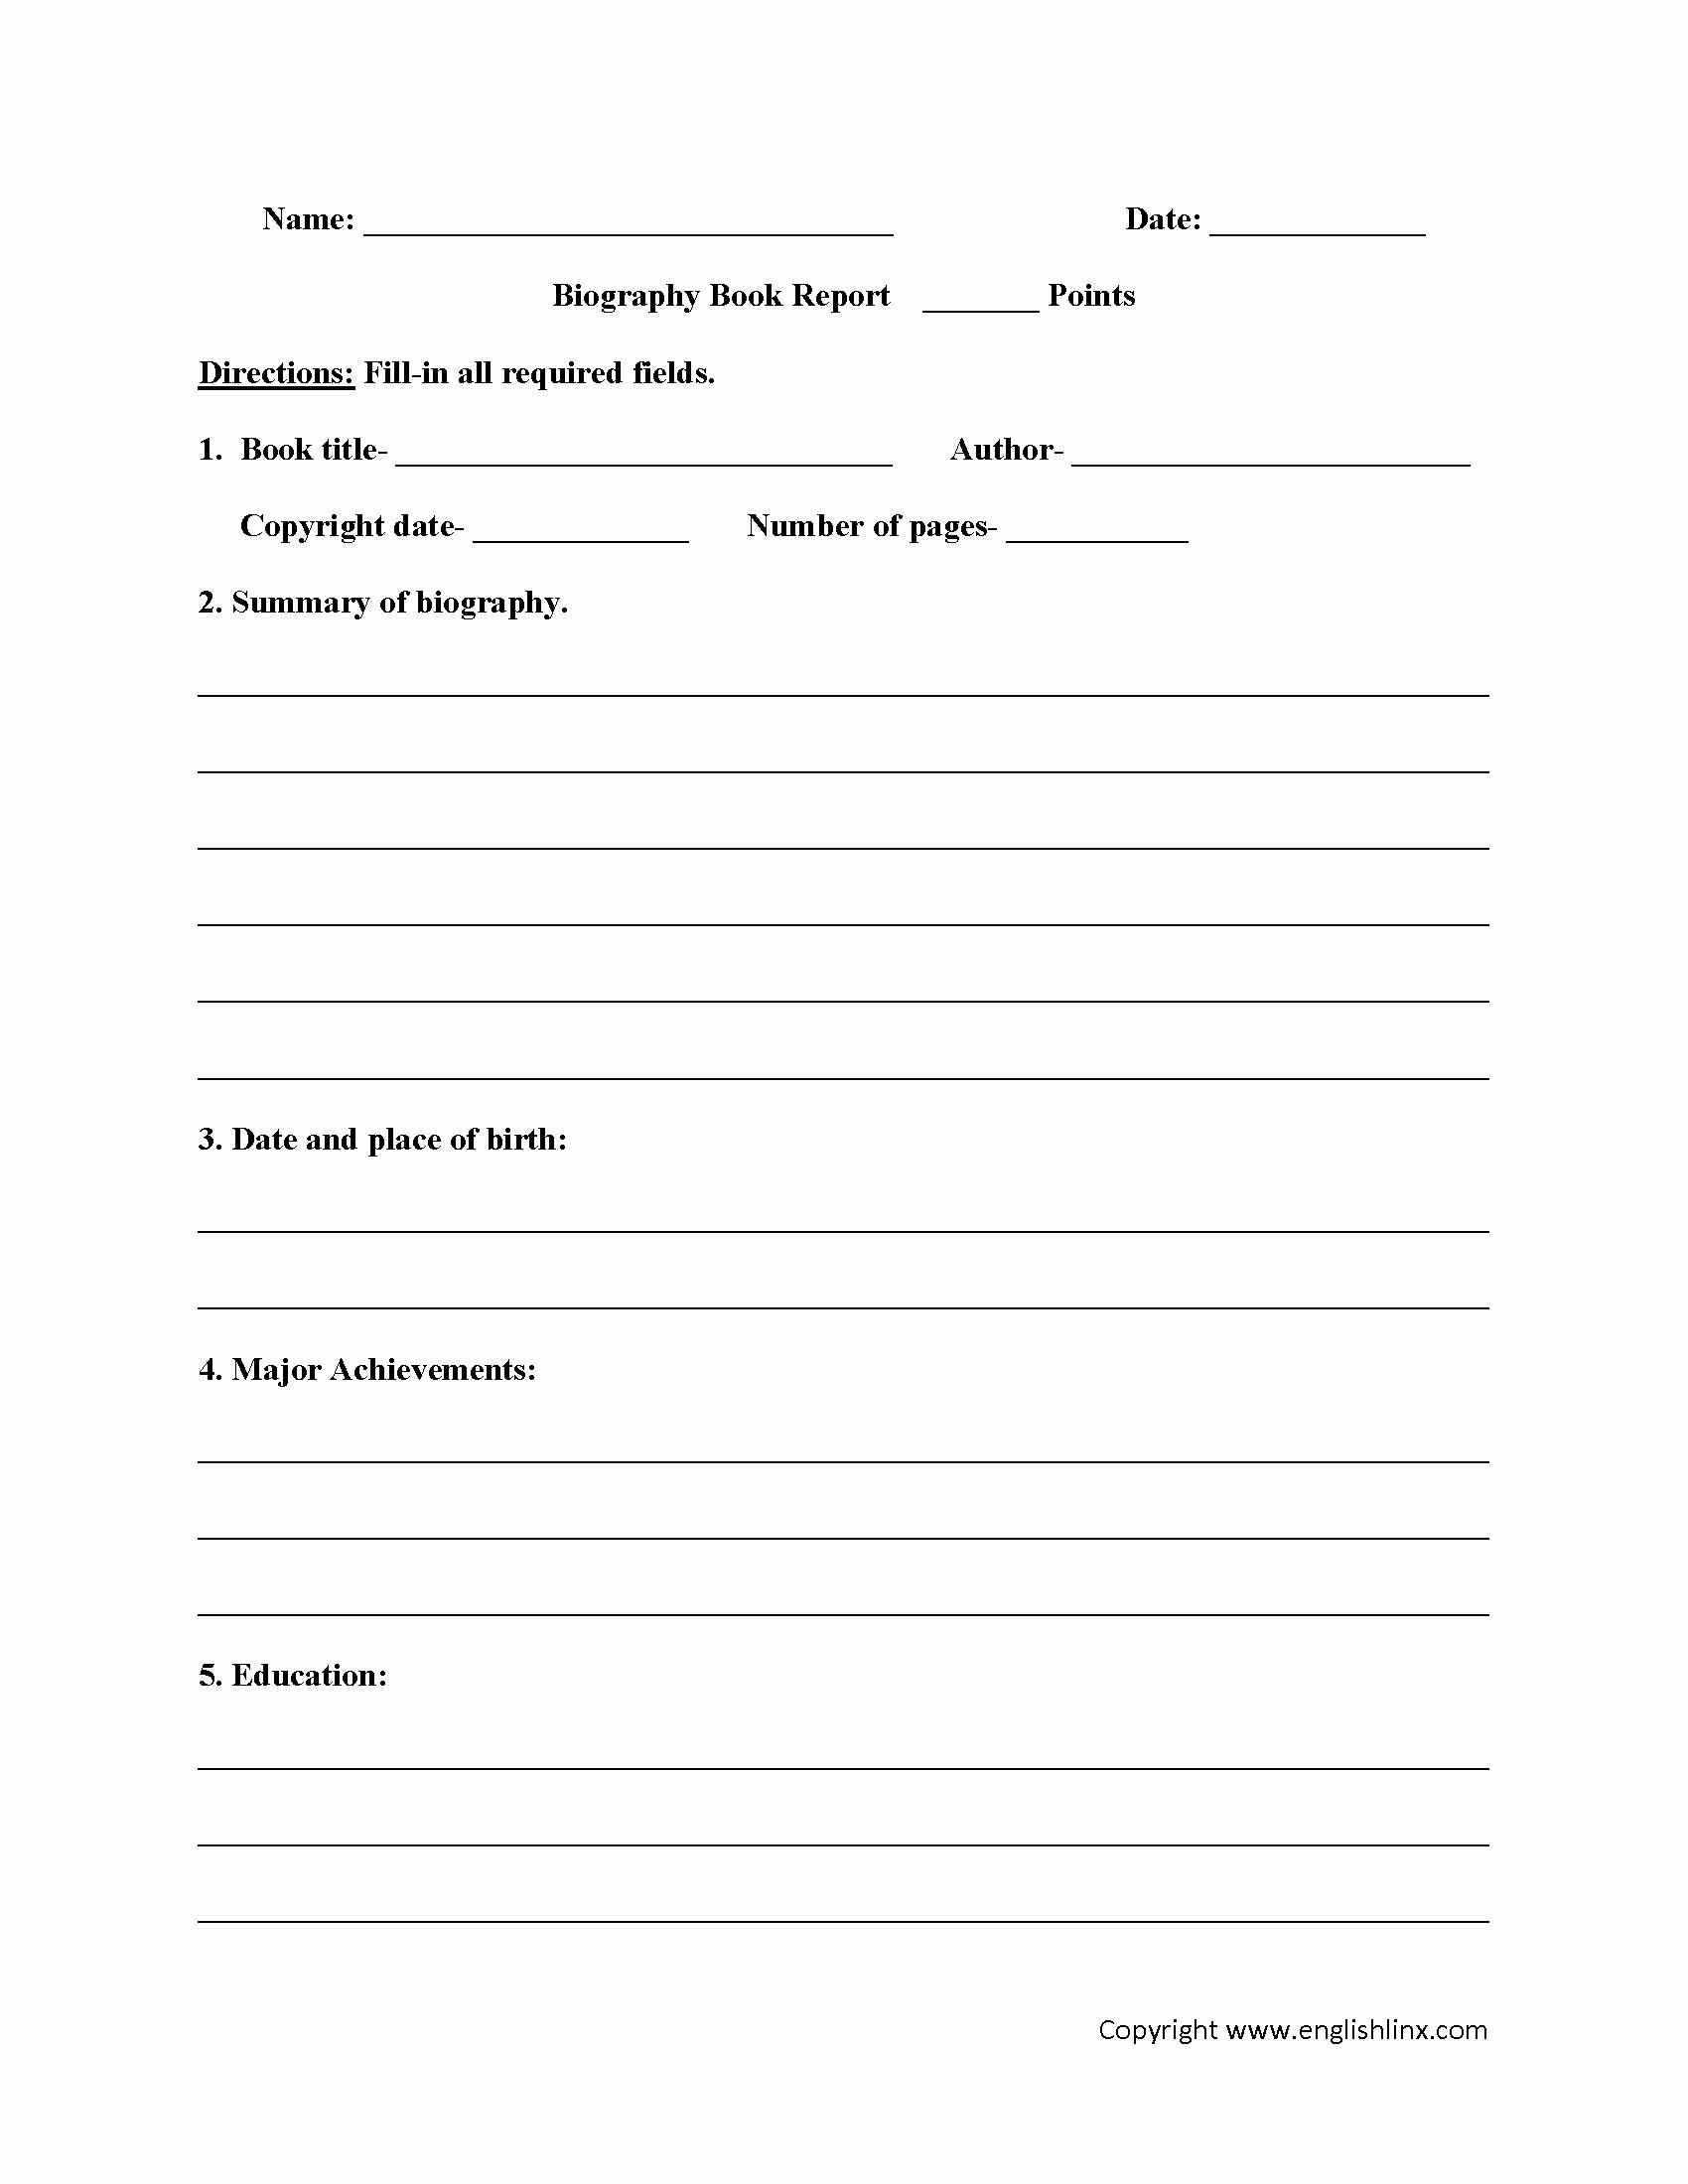 Book Report Examples 5th Grade Elegant Biography Book Report Worksheets Englishlinx Board